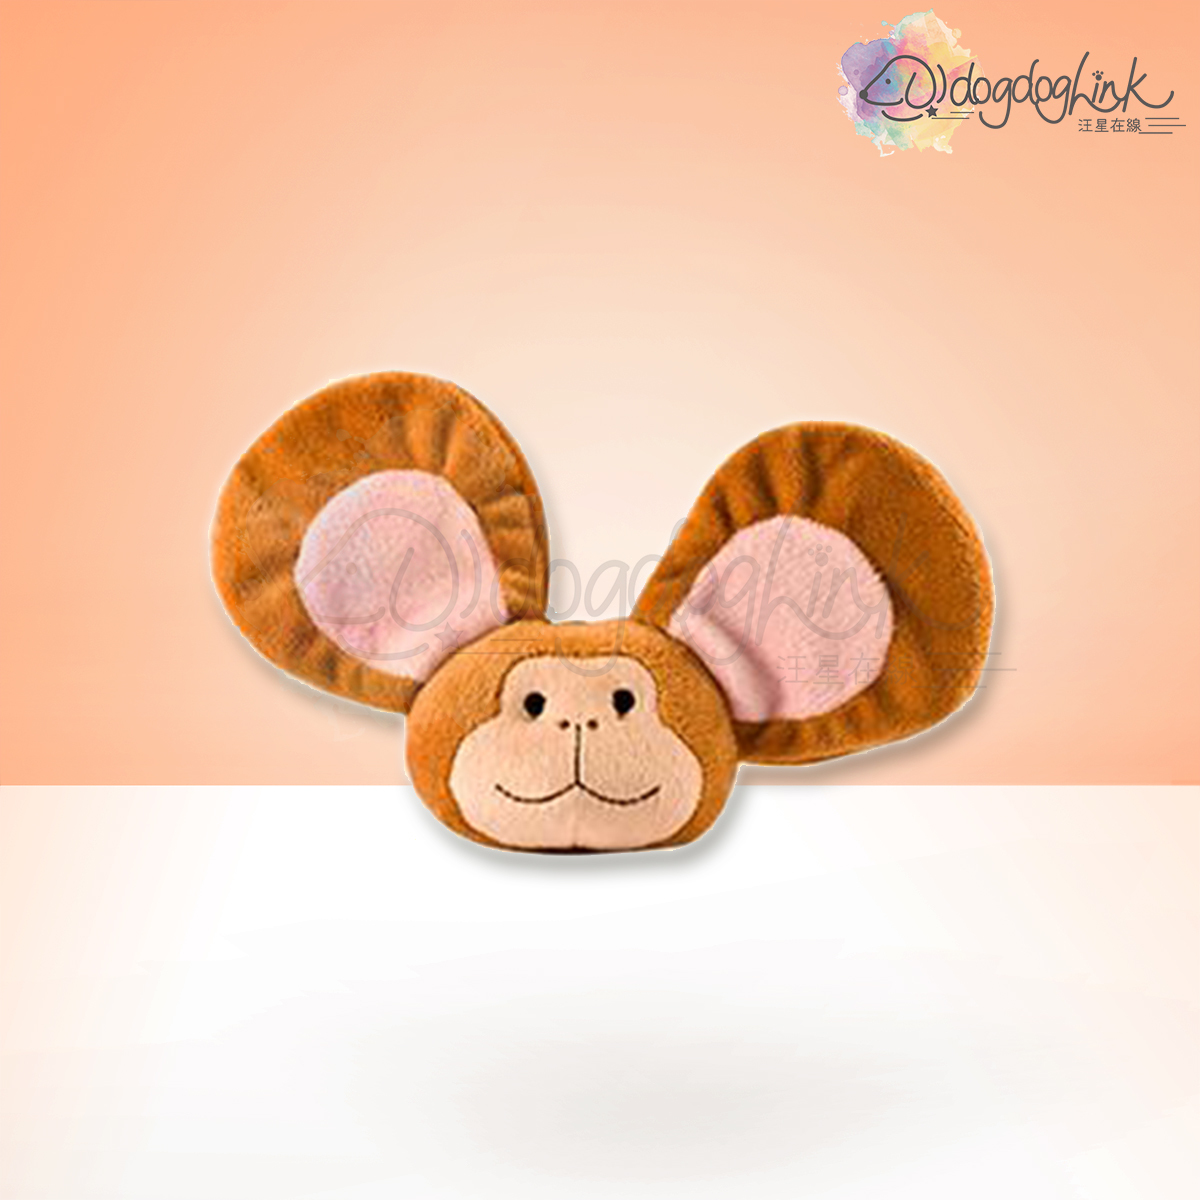 Big Ear - Monkey 11x18x6cm